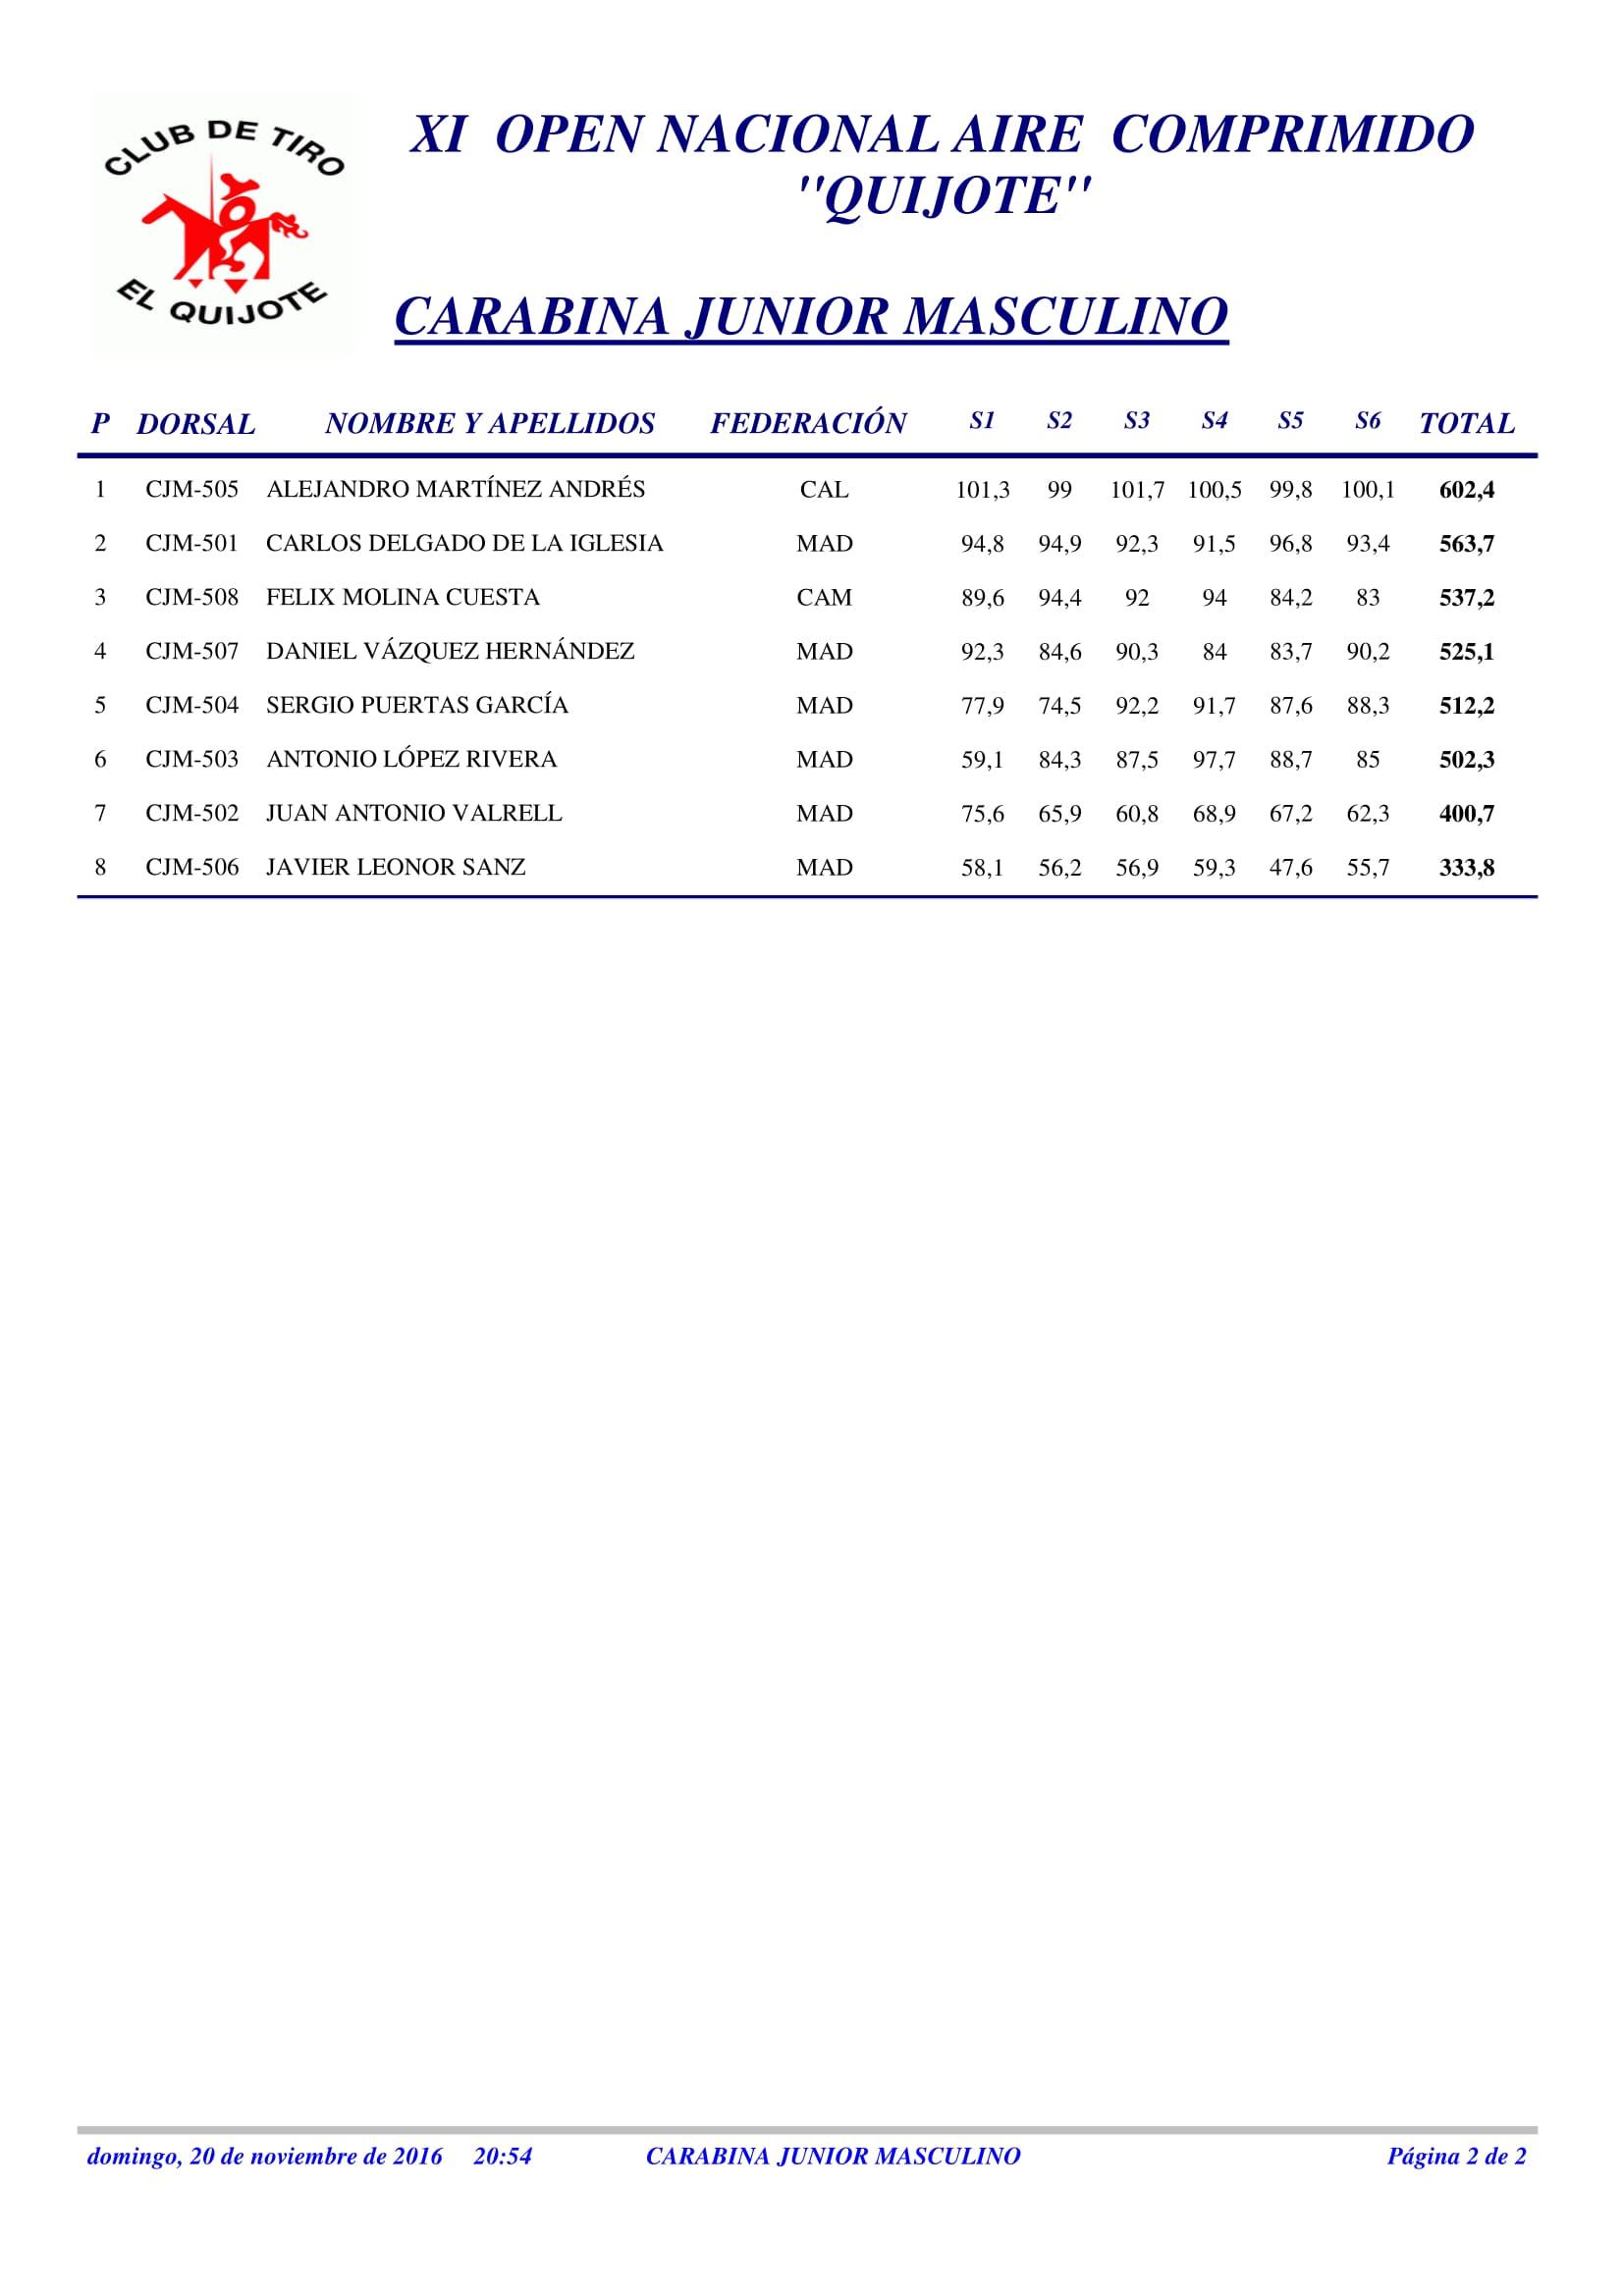 carabina-juniors-masculinos-1